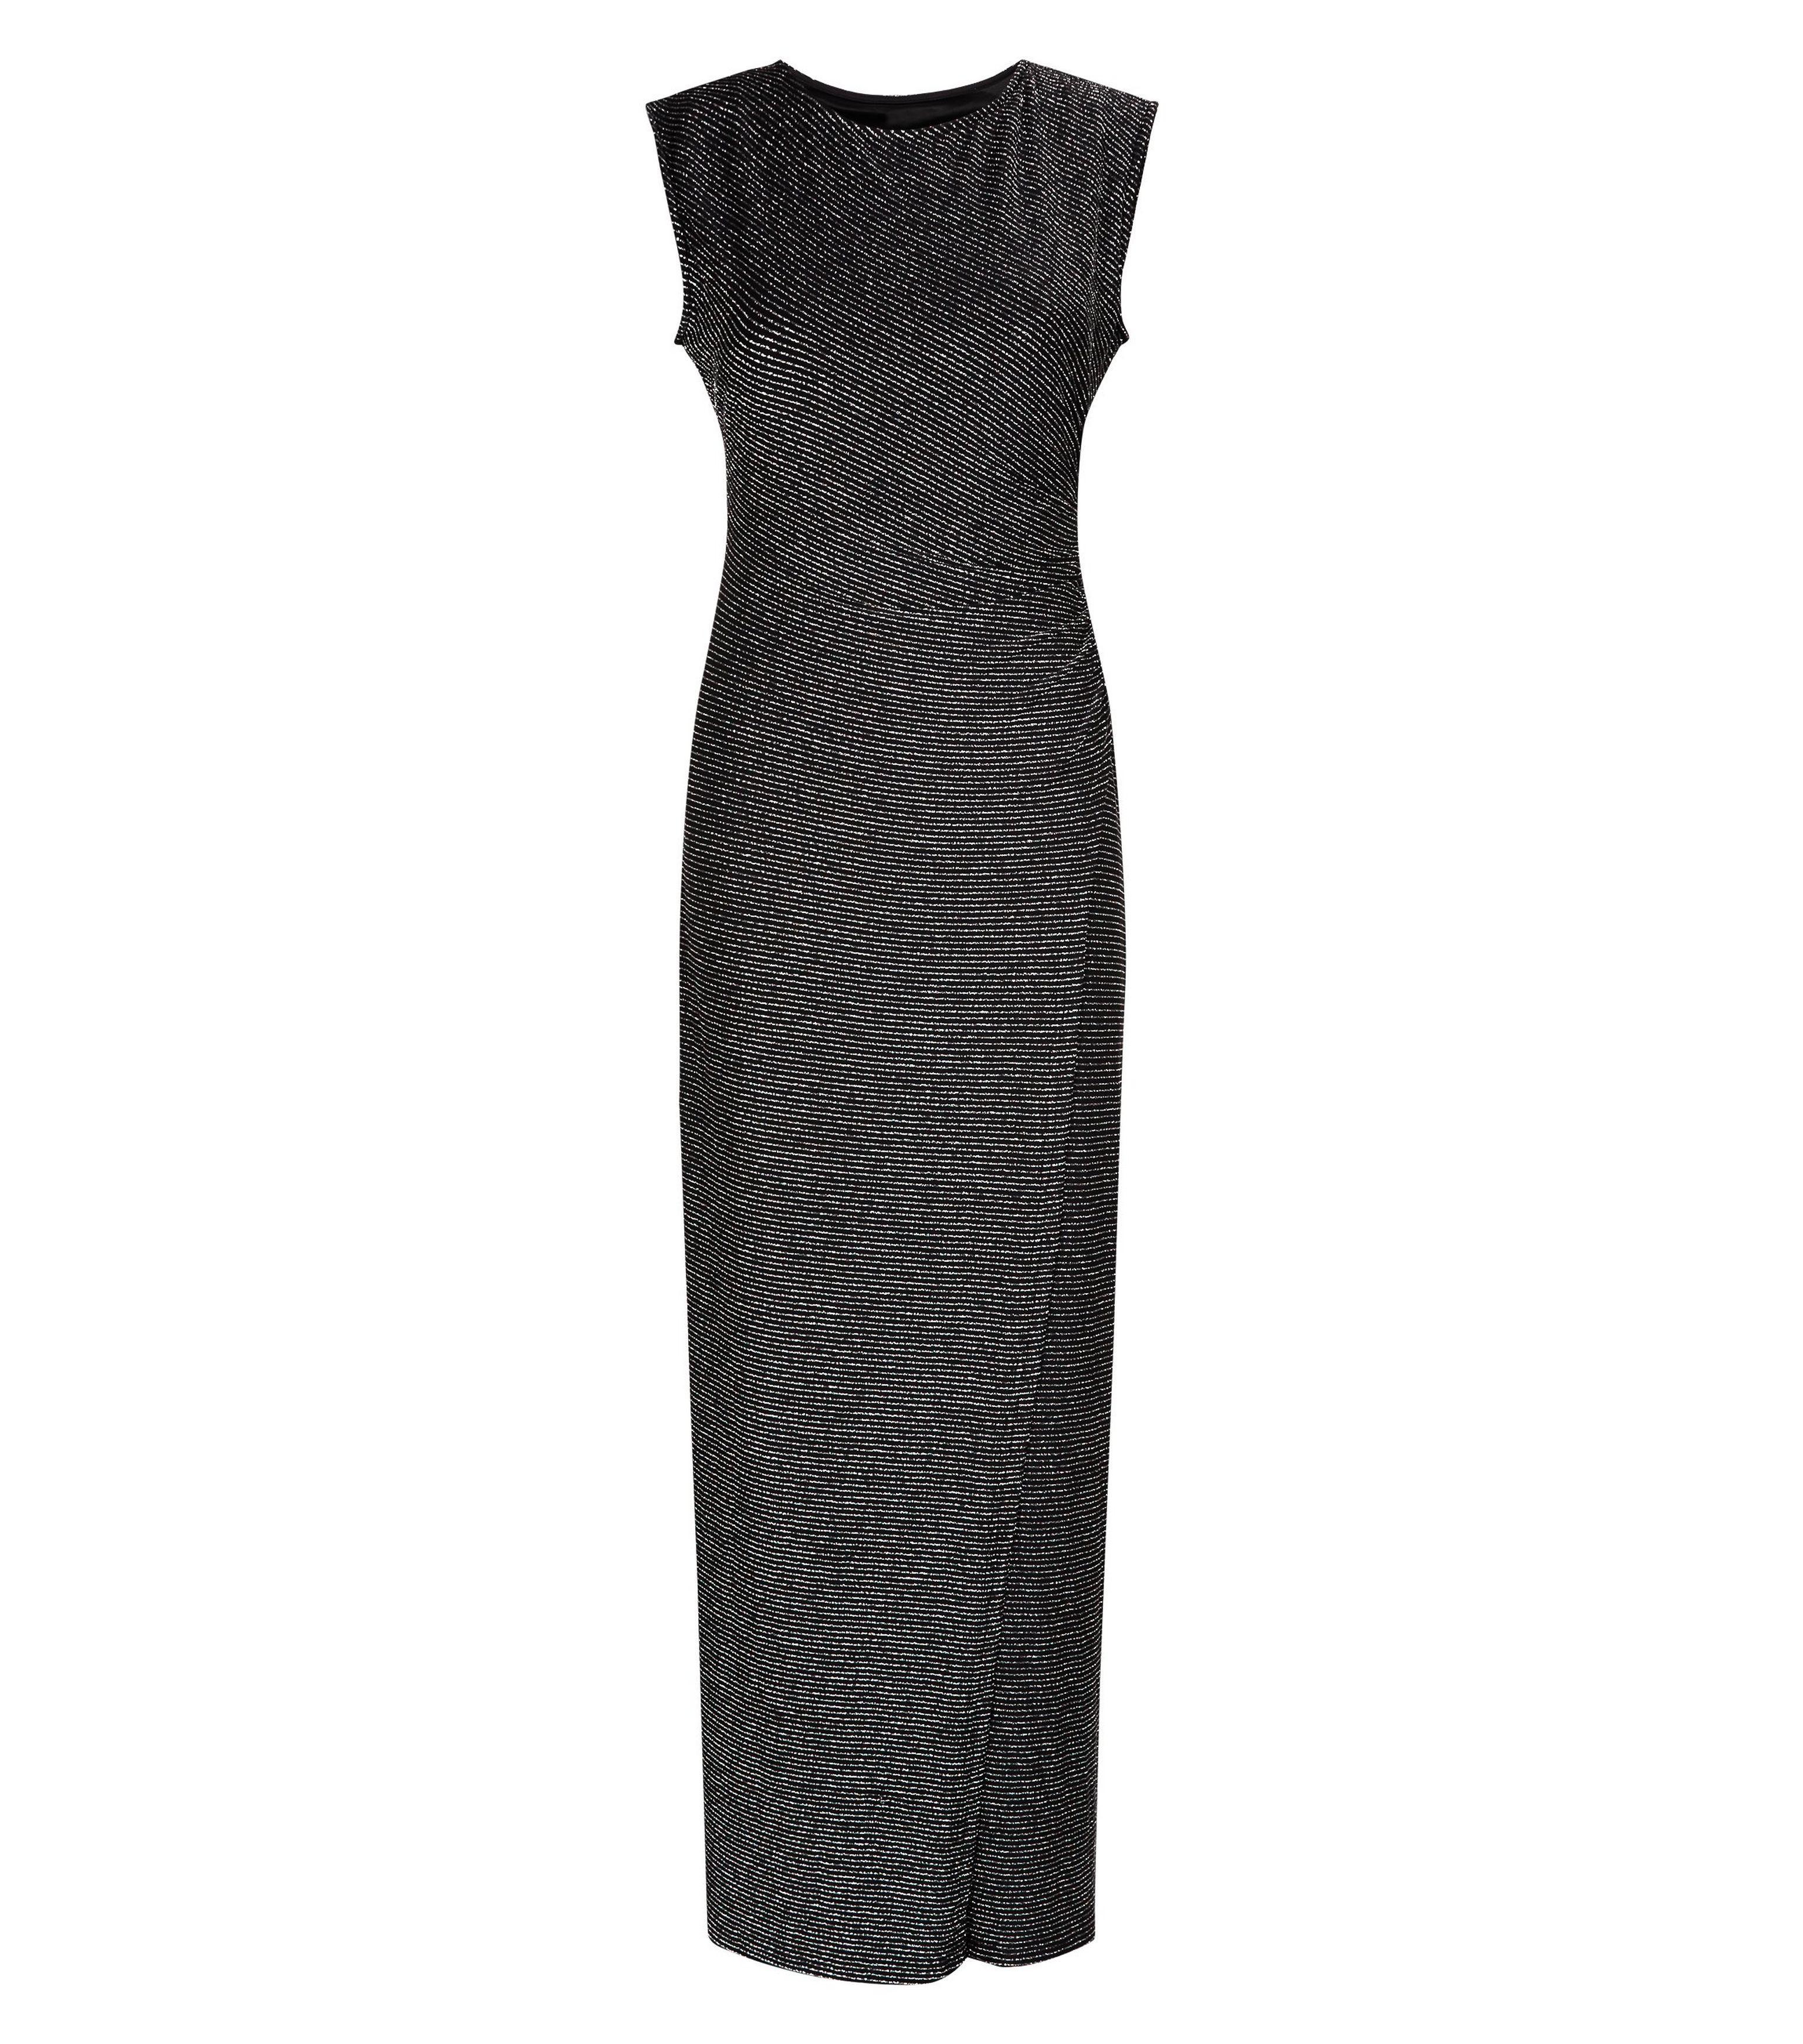 c36723adfa3b Mela Black Metallic Ruched Side Maxi Dress in Black - Lyst